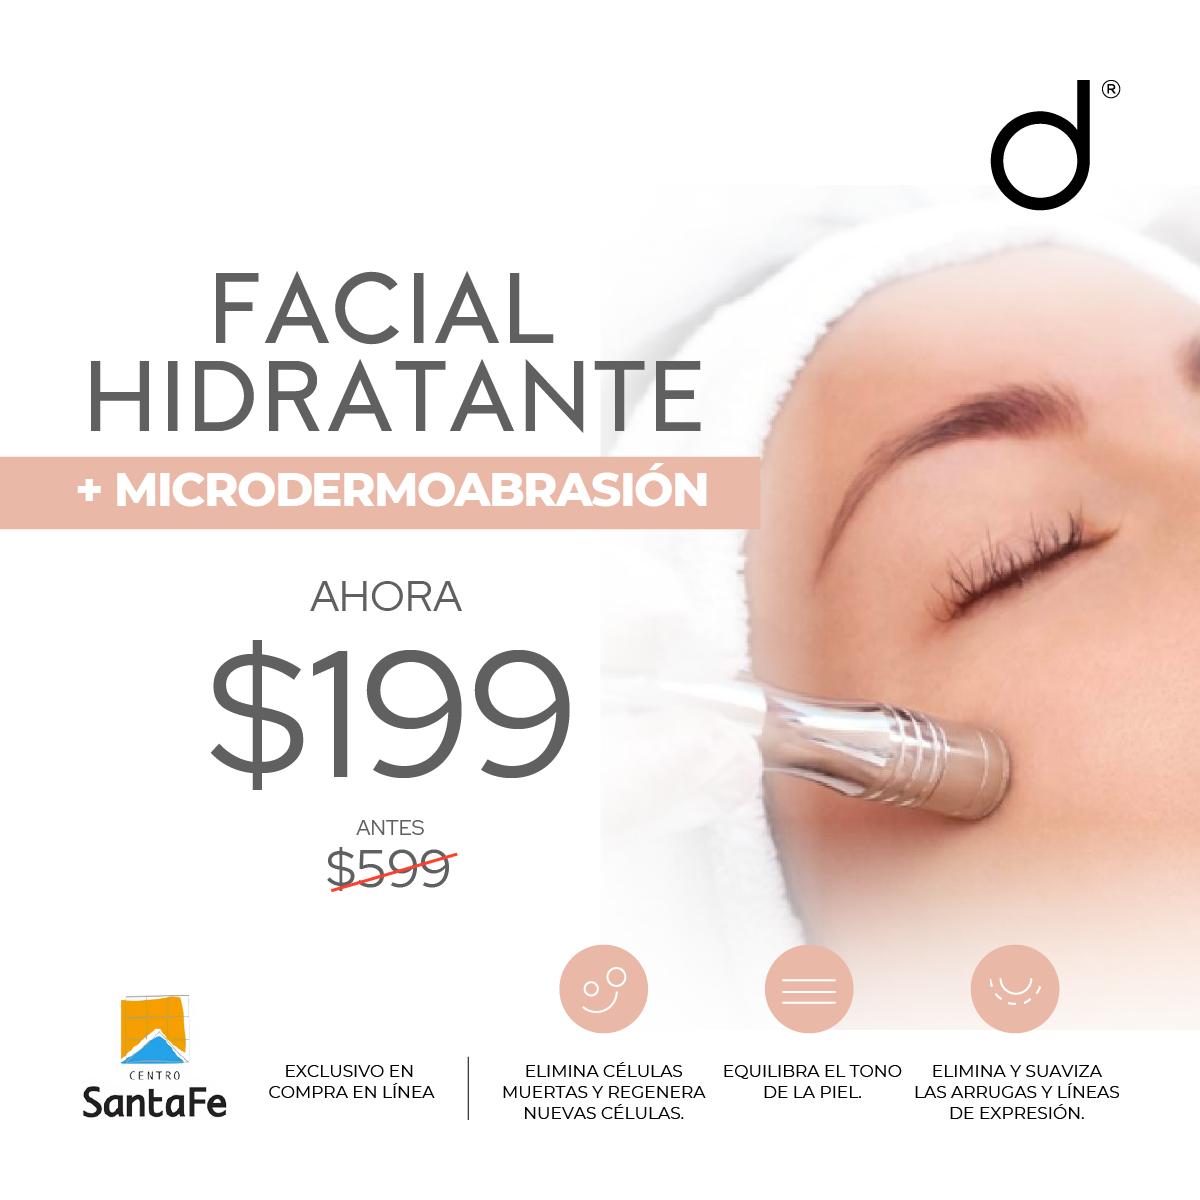 Facial Hidratante + Microdermoabrasión- SÓLO CENTRO COMERCIAL SANTA FE&w=900&h=900&fit=crop